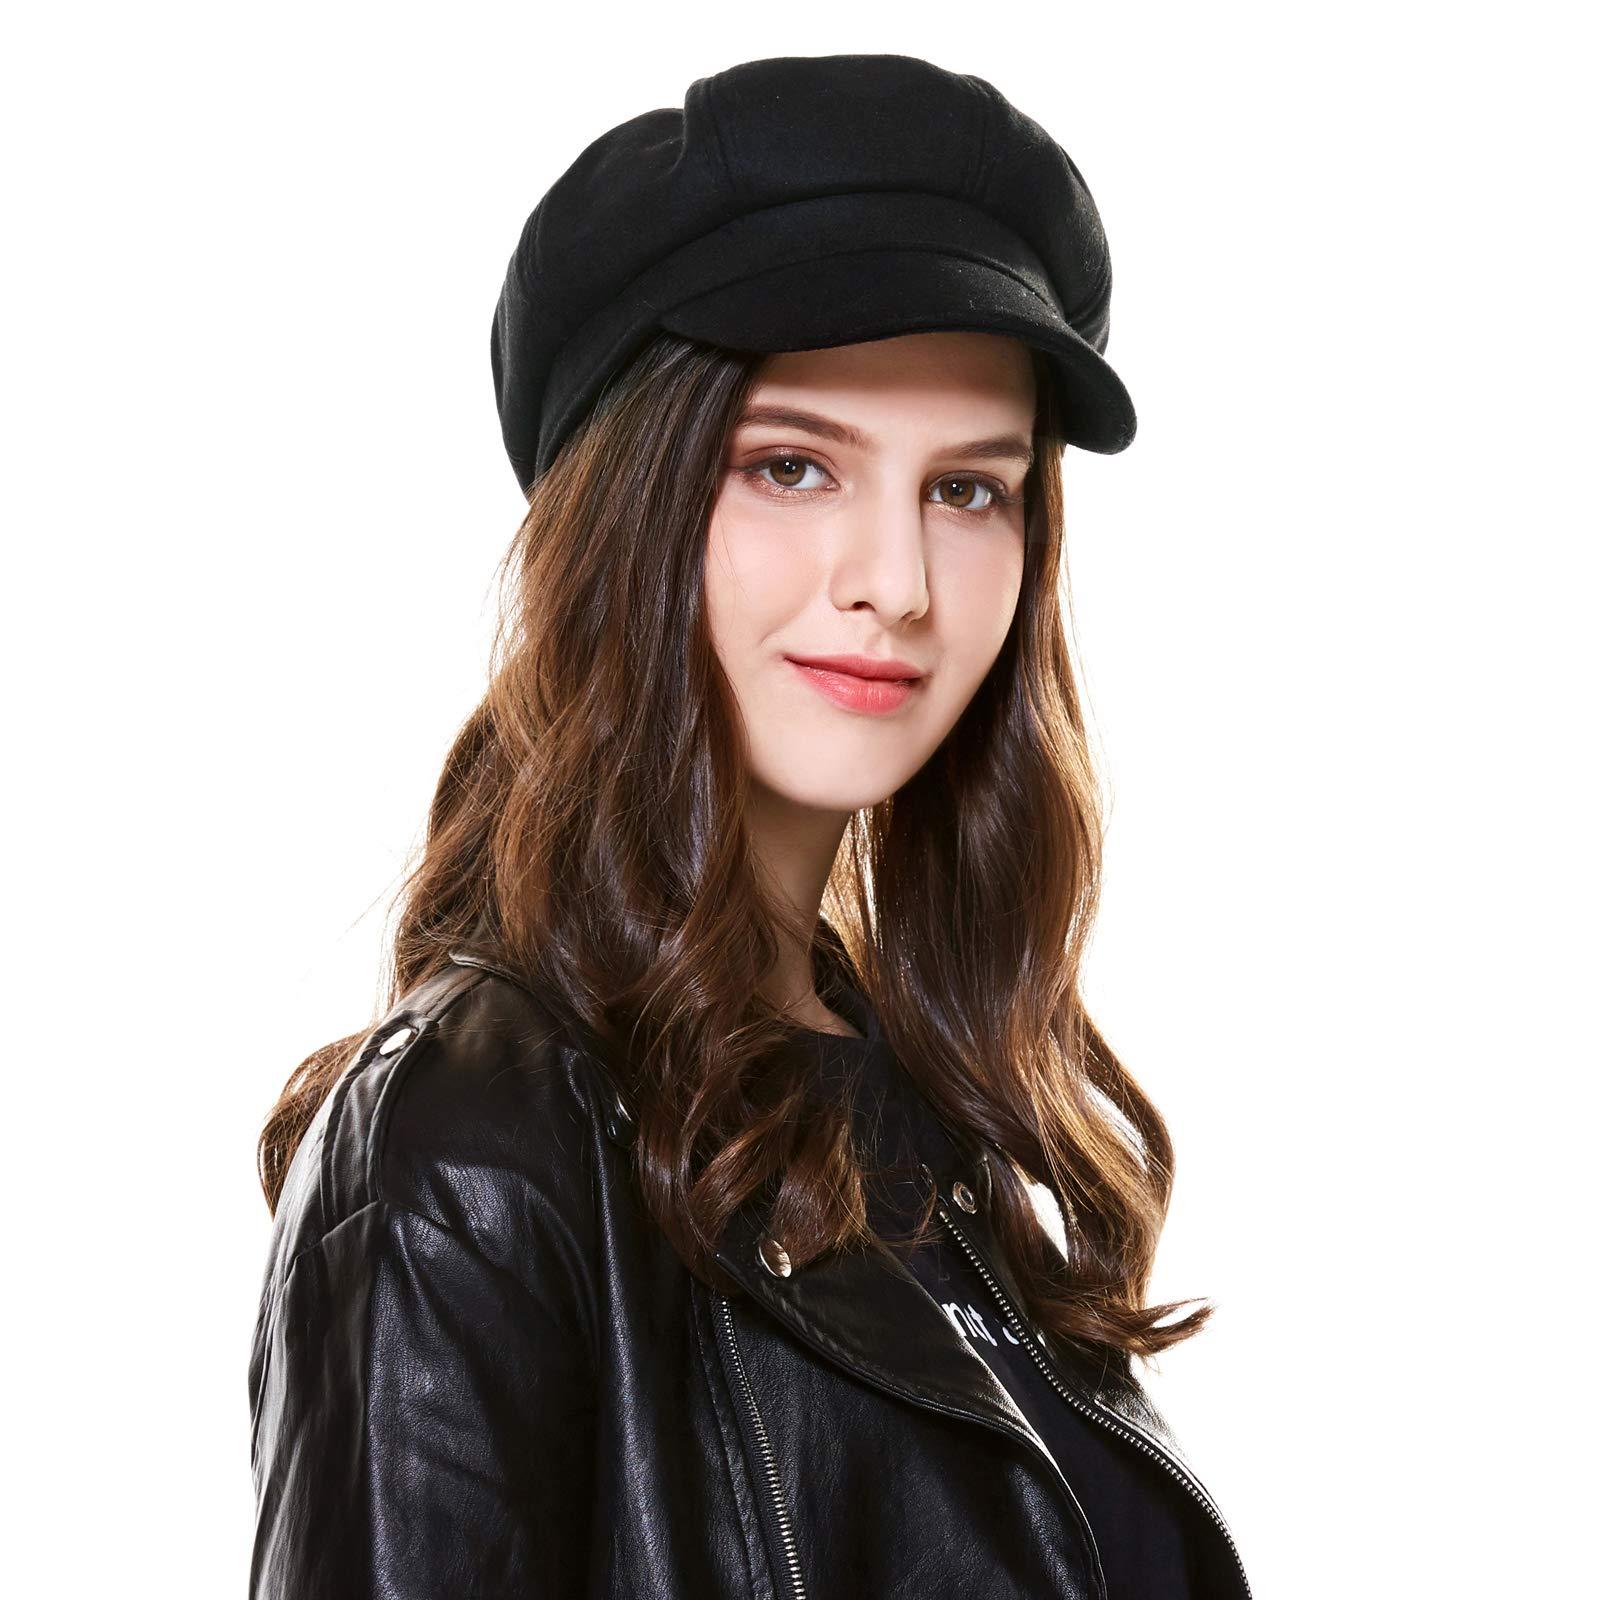 Kajeer Vintage Wool Floppy Adjustable Newsboys Hats for Women